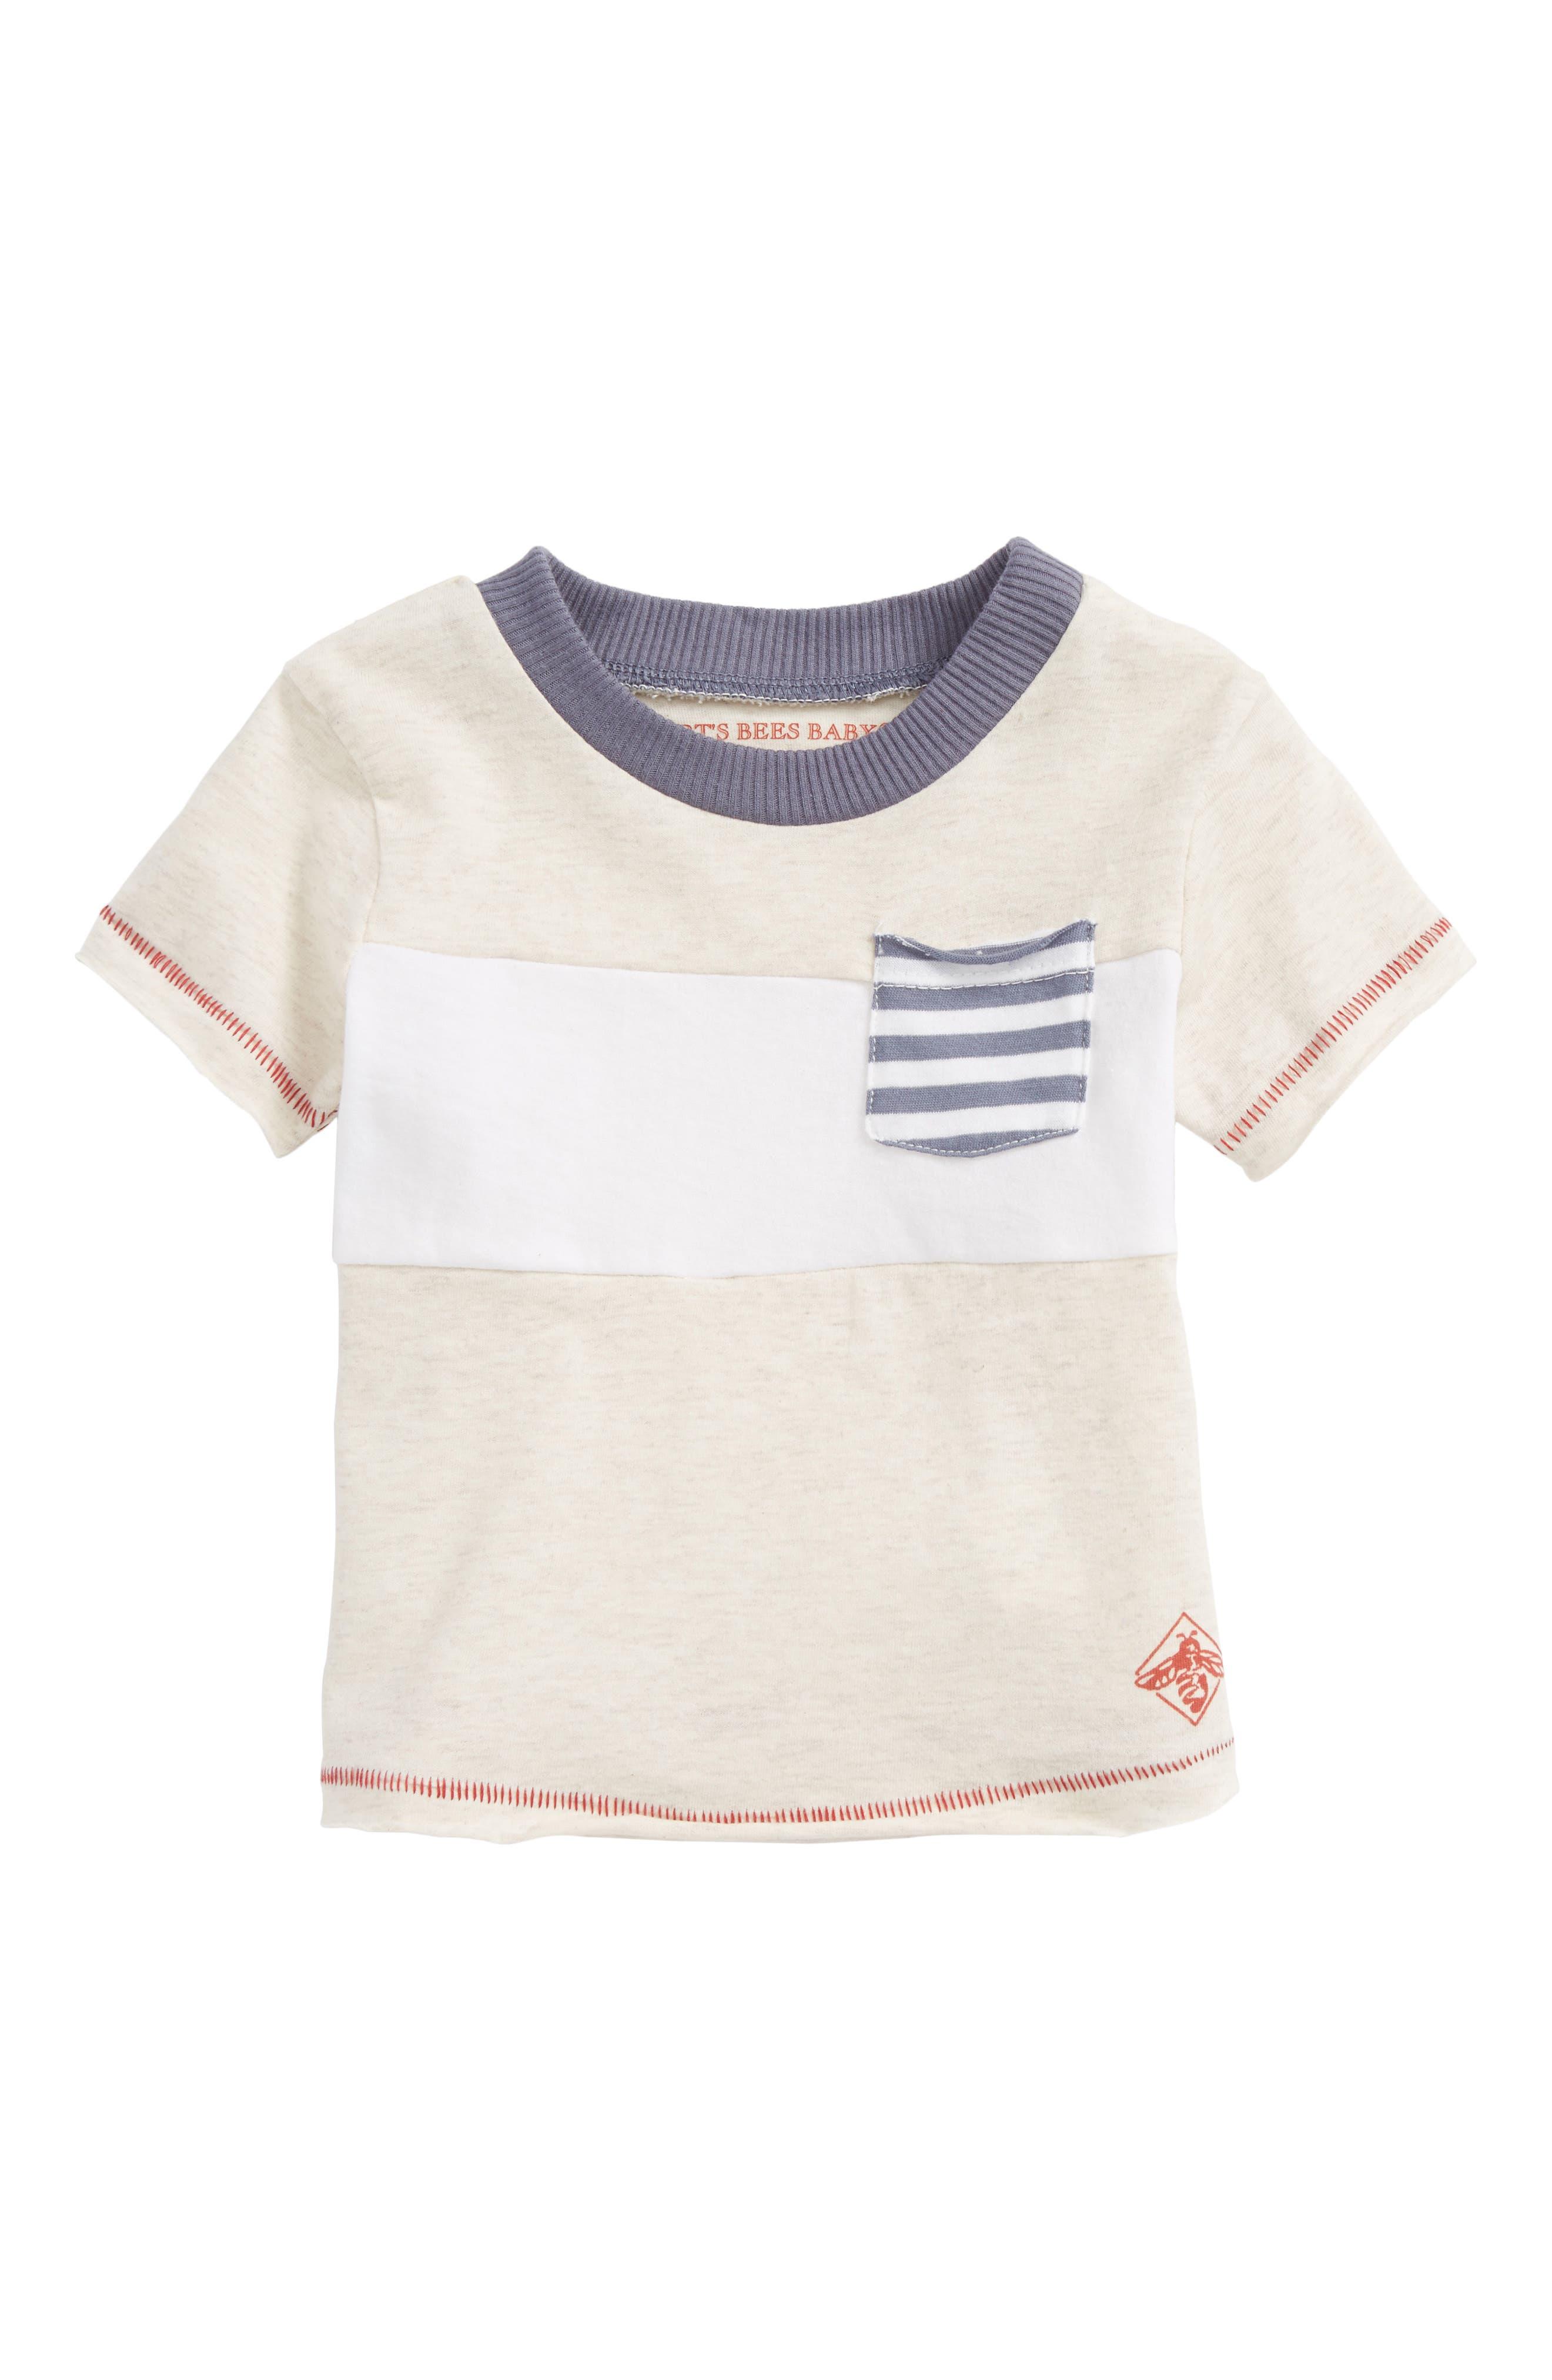 Alternate Image 1 Selected - Burt's Bees Baby Organic Cotton Pocket T-Shirt (Baby Boys)